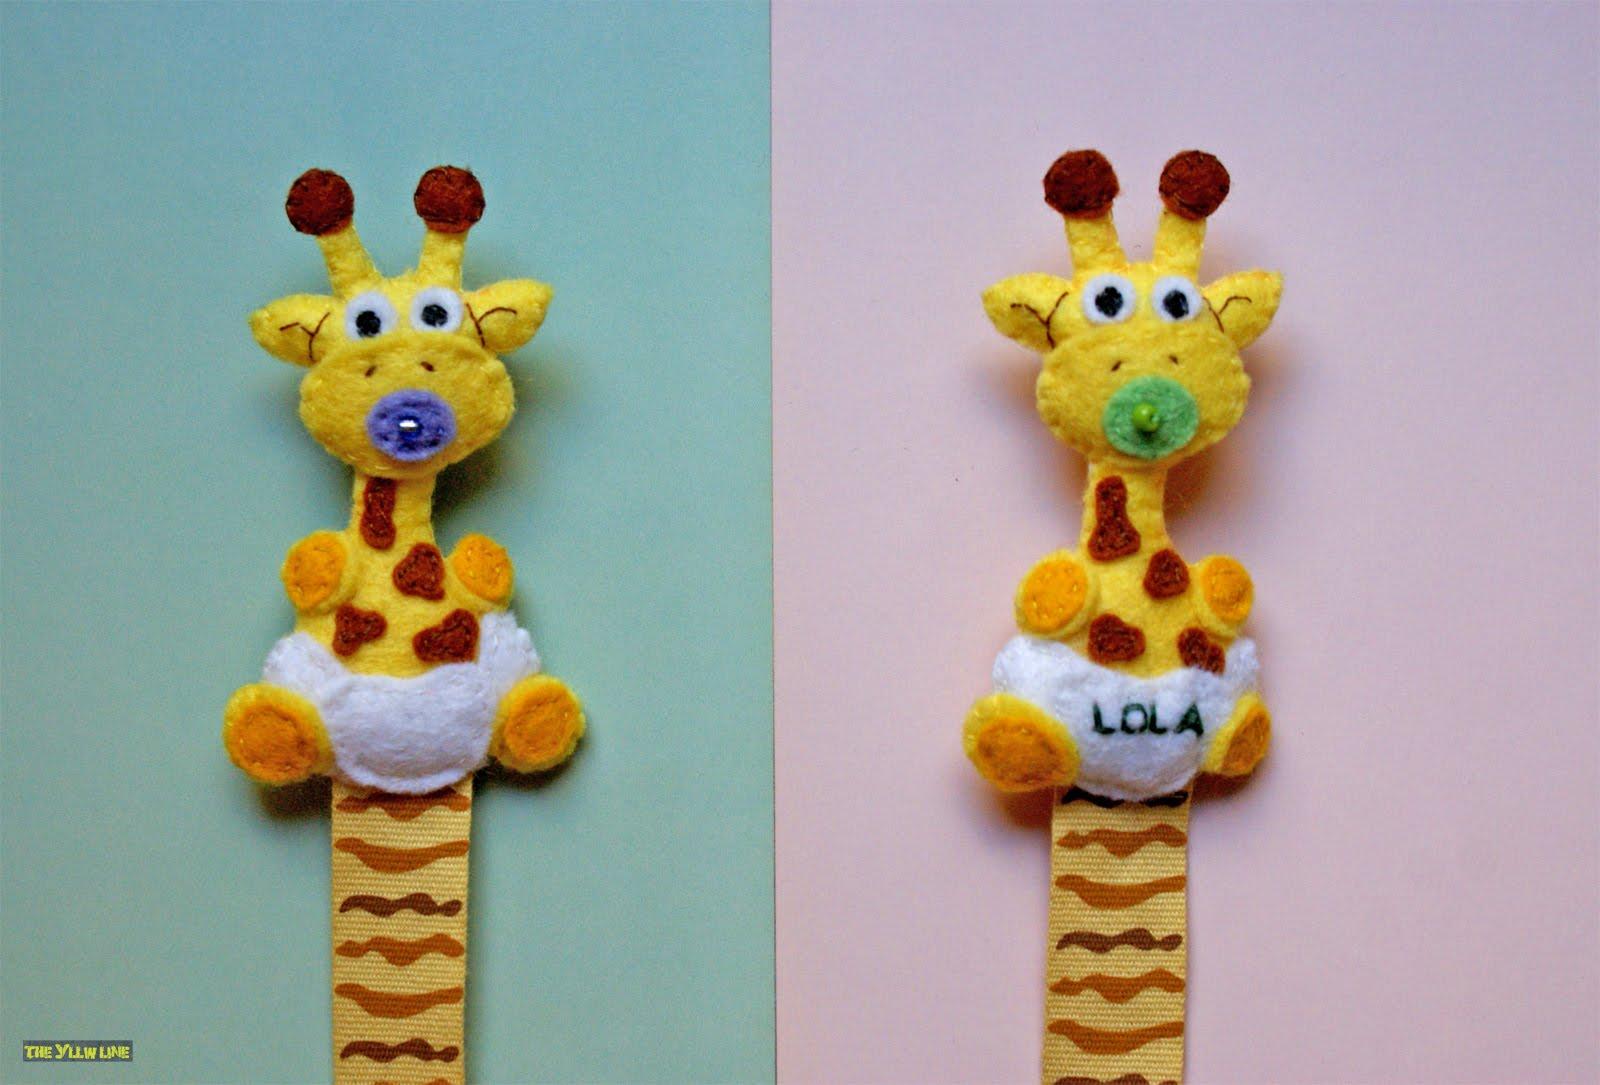 THE YLLW LINE: Chupeteros de fieltro: ¡Más jirafas!